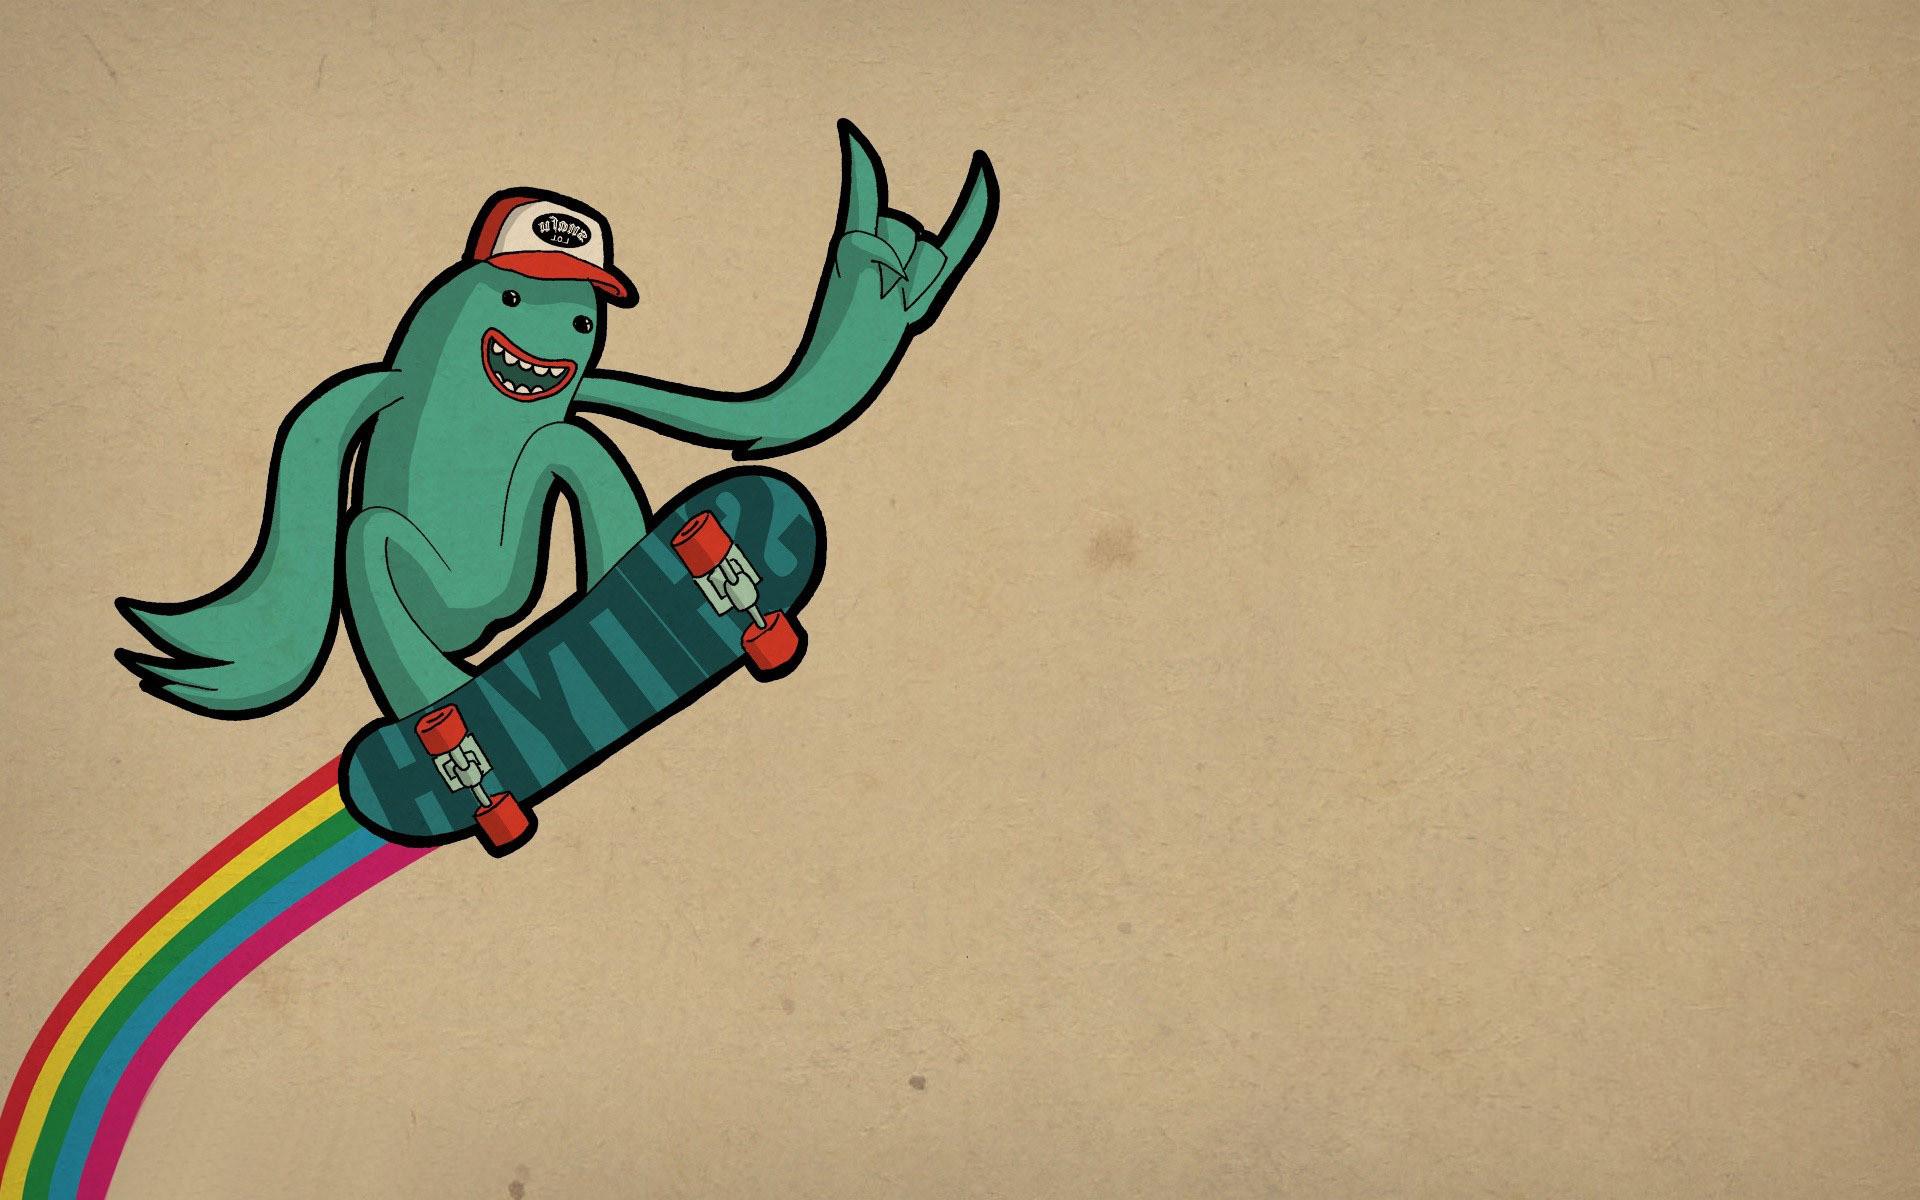 Skateboard Brand Wallpaper HD ·① WallpaperTag